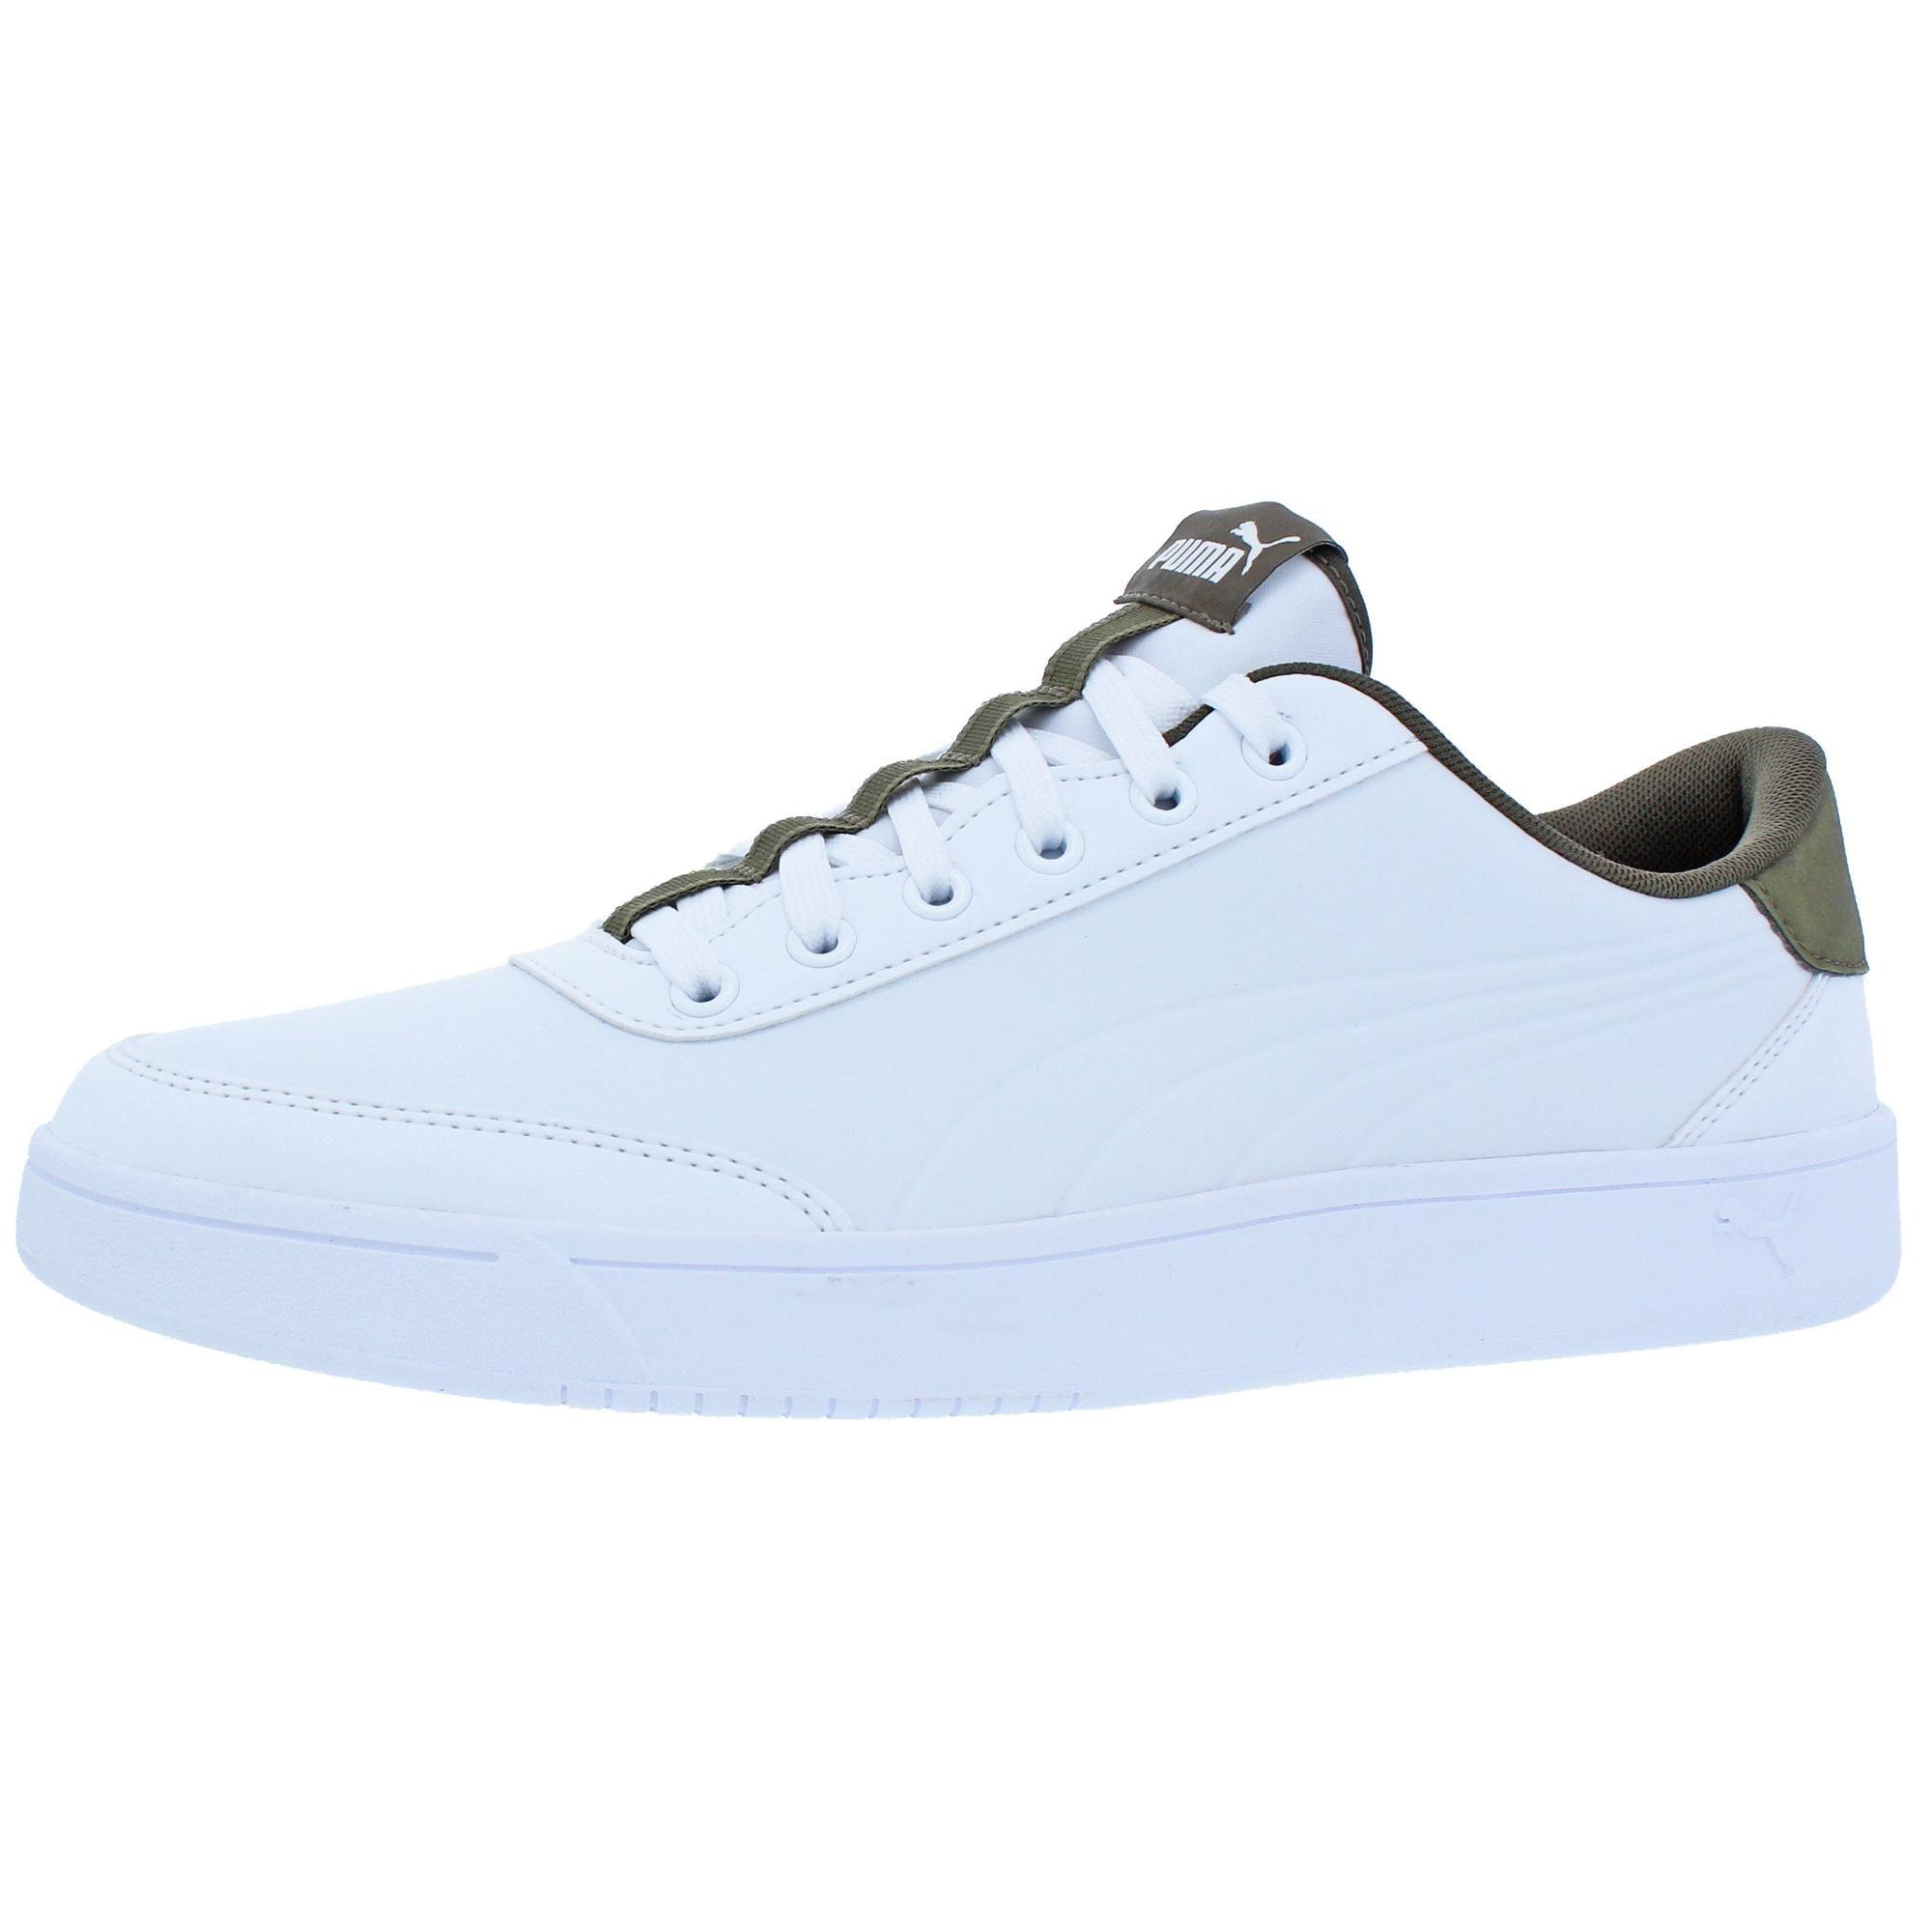 Overstock - 22727112 - Puma White